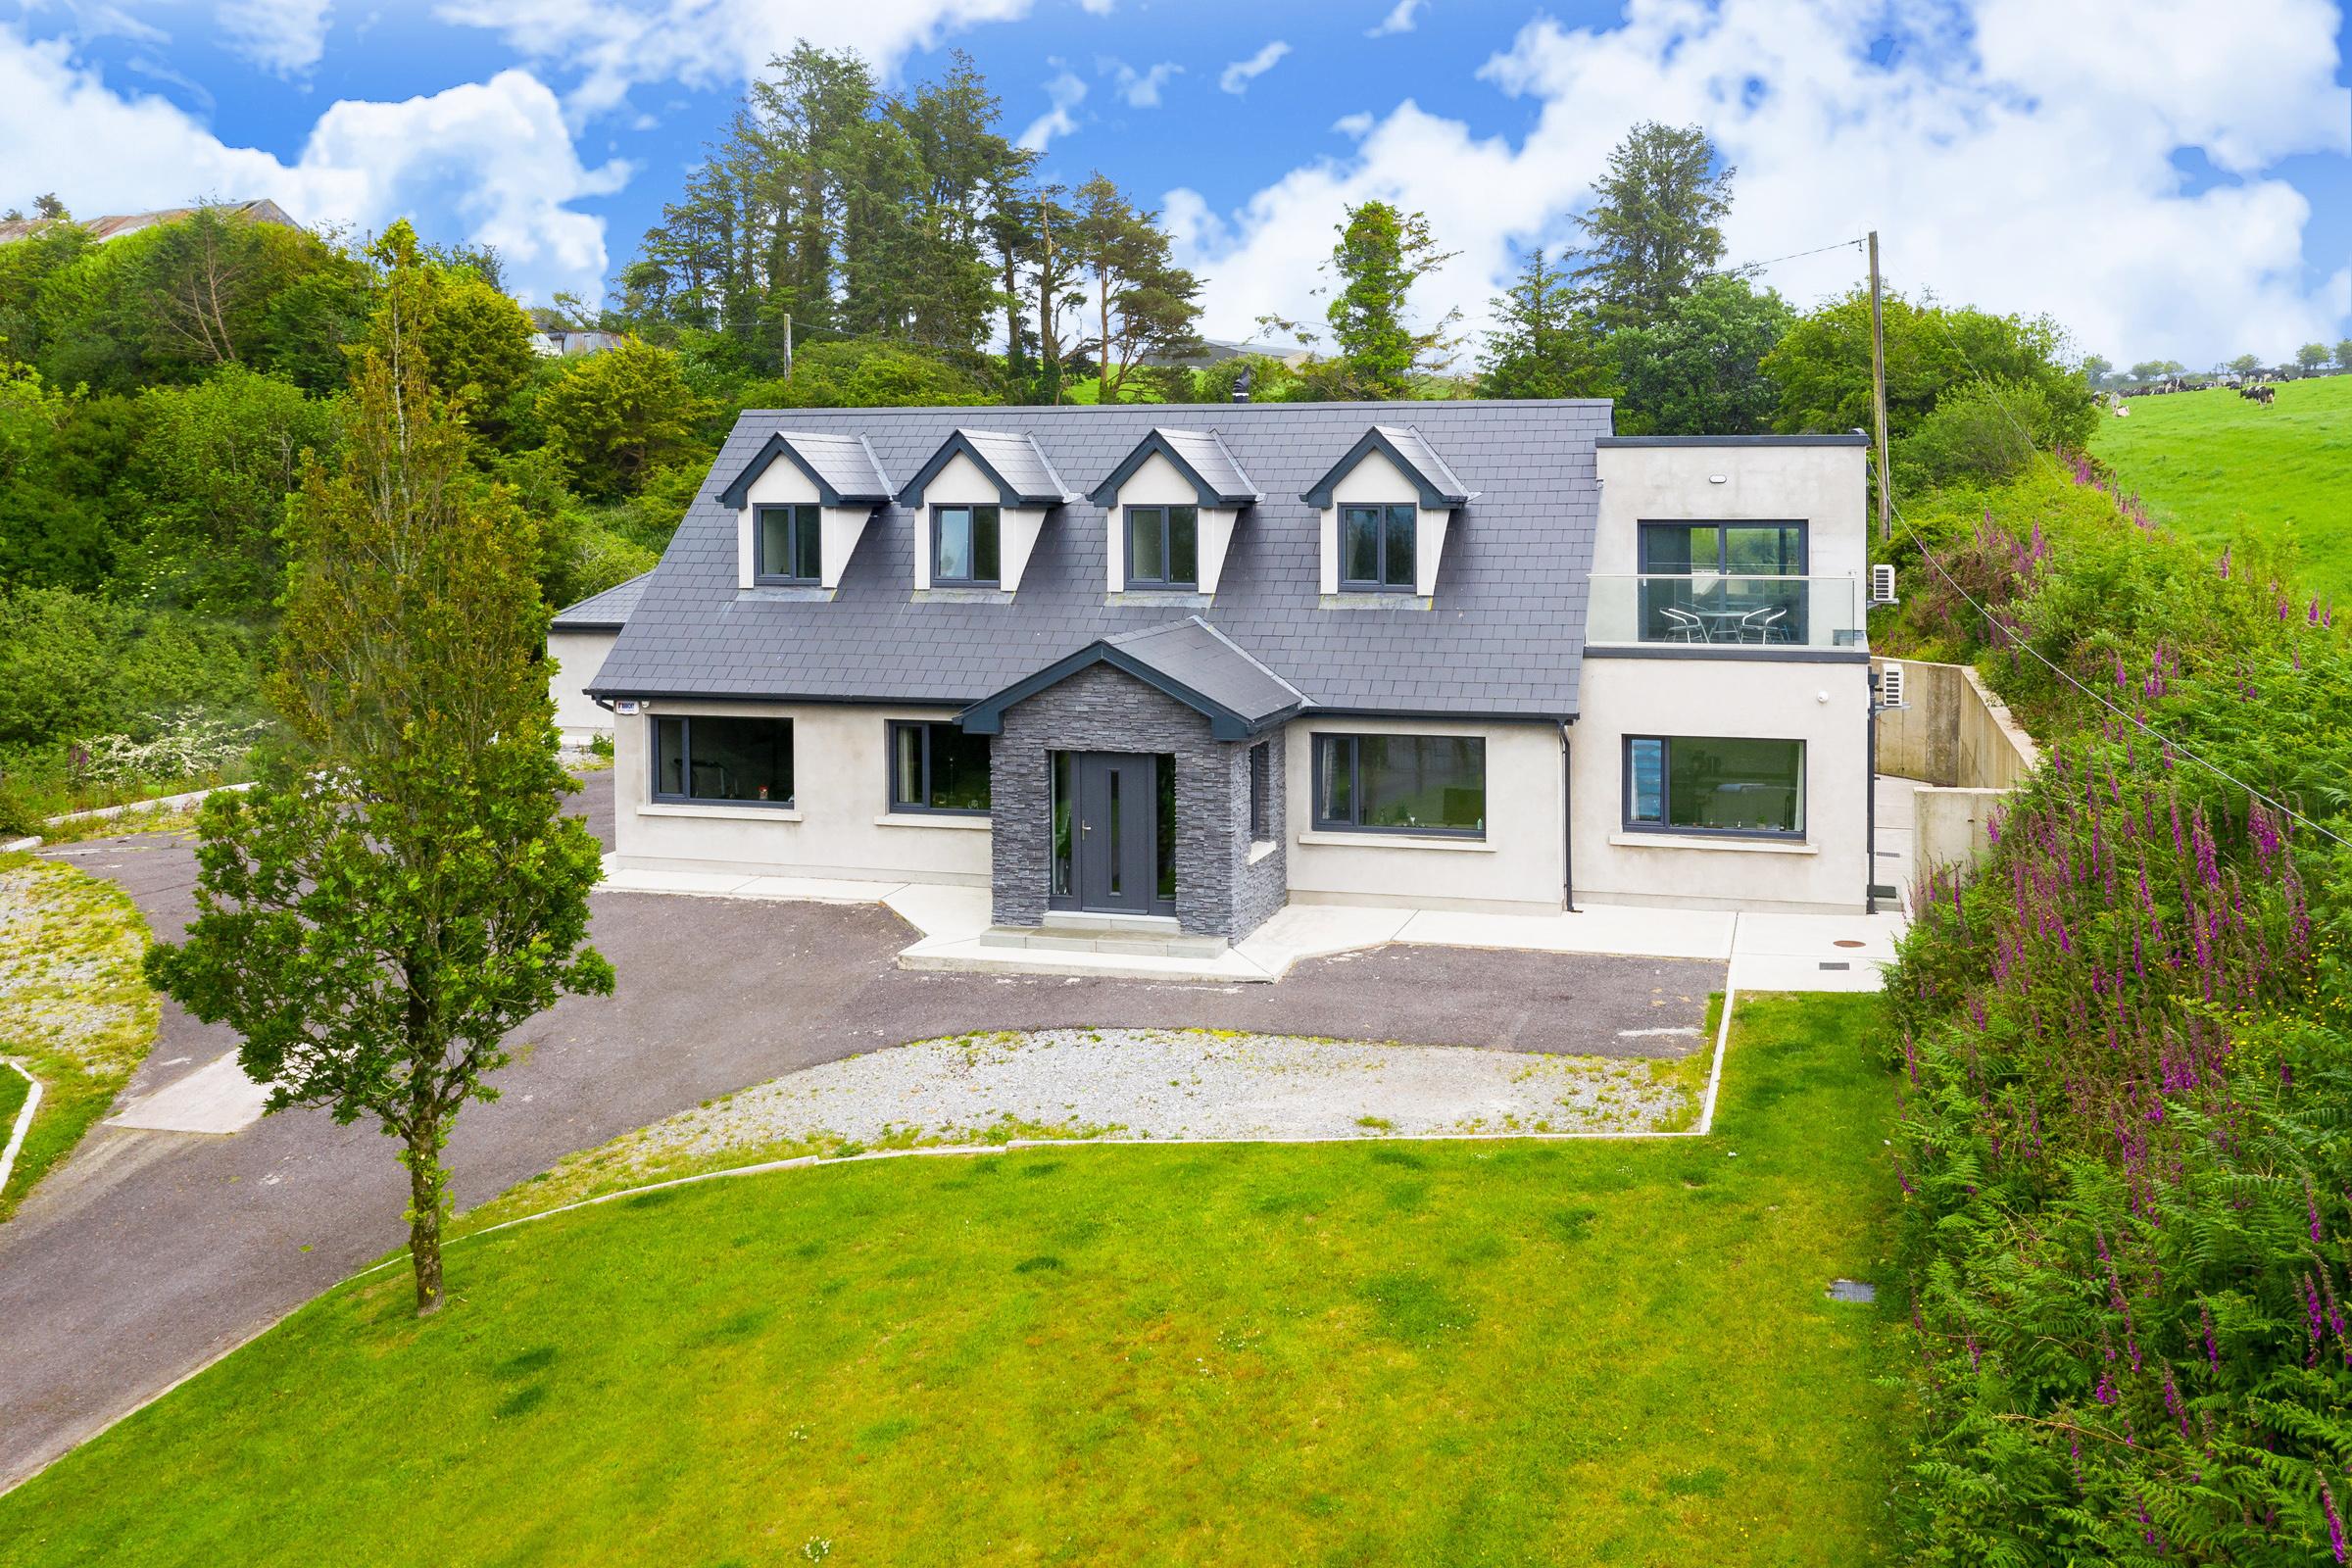 Pinewood, Aherla More, Aherla, County Cork P31 KR63